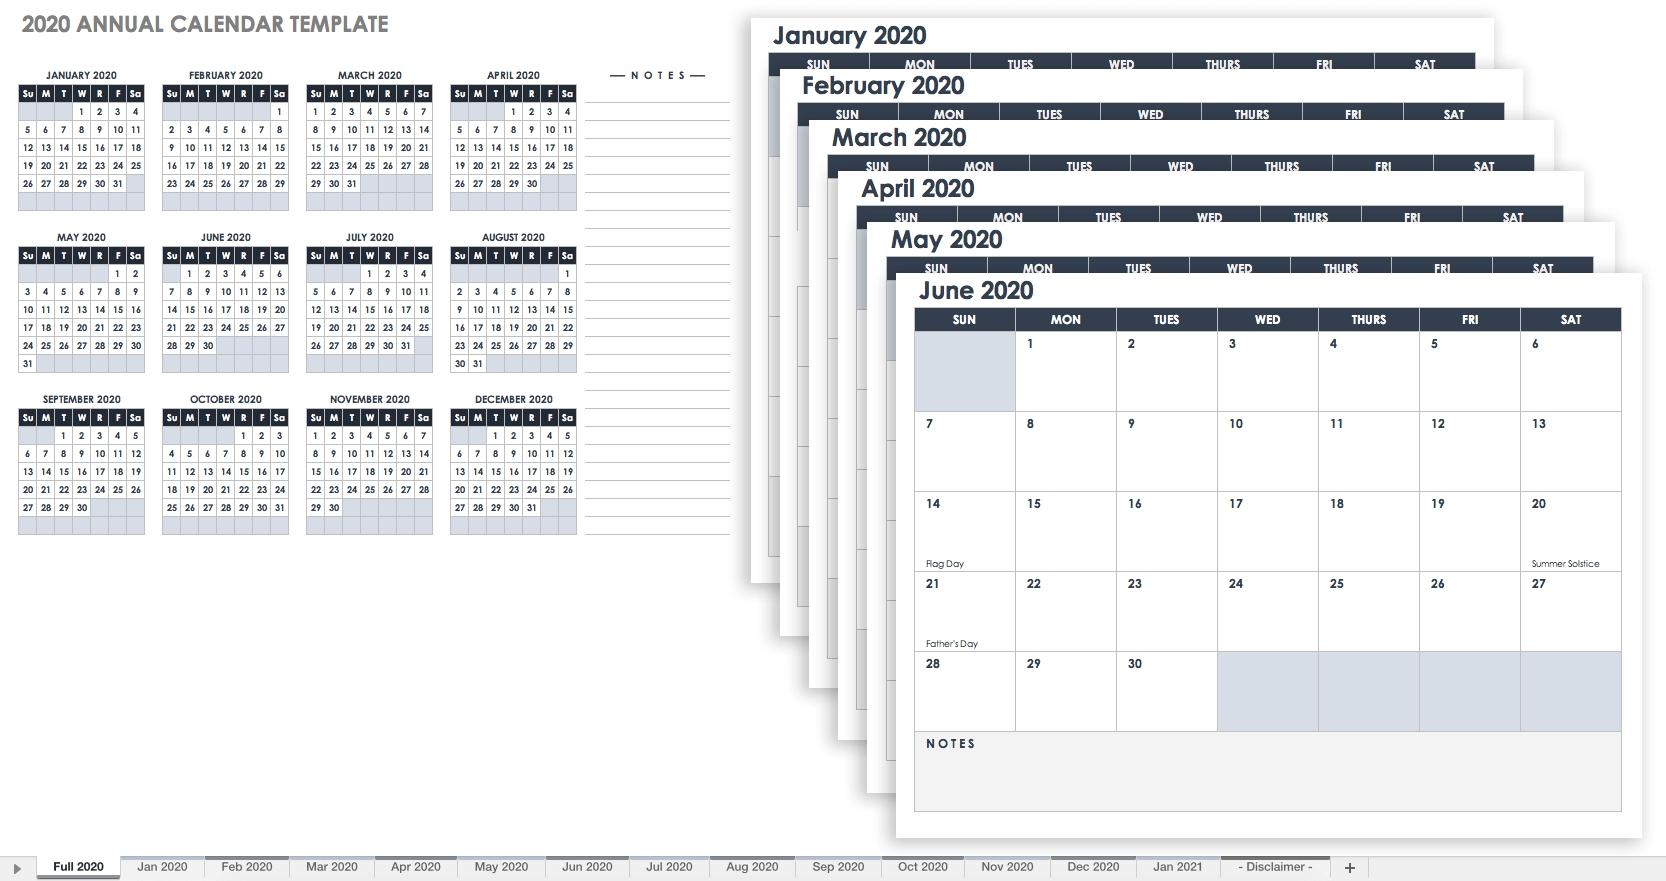 Free Blank Calendar Templates - Smartsheet with 9/80 Scheduling Calendar 2020